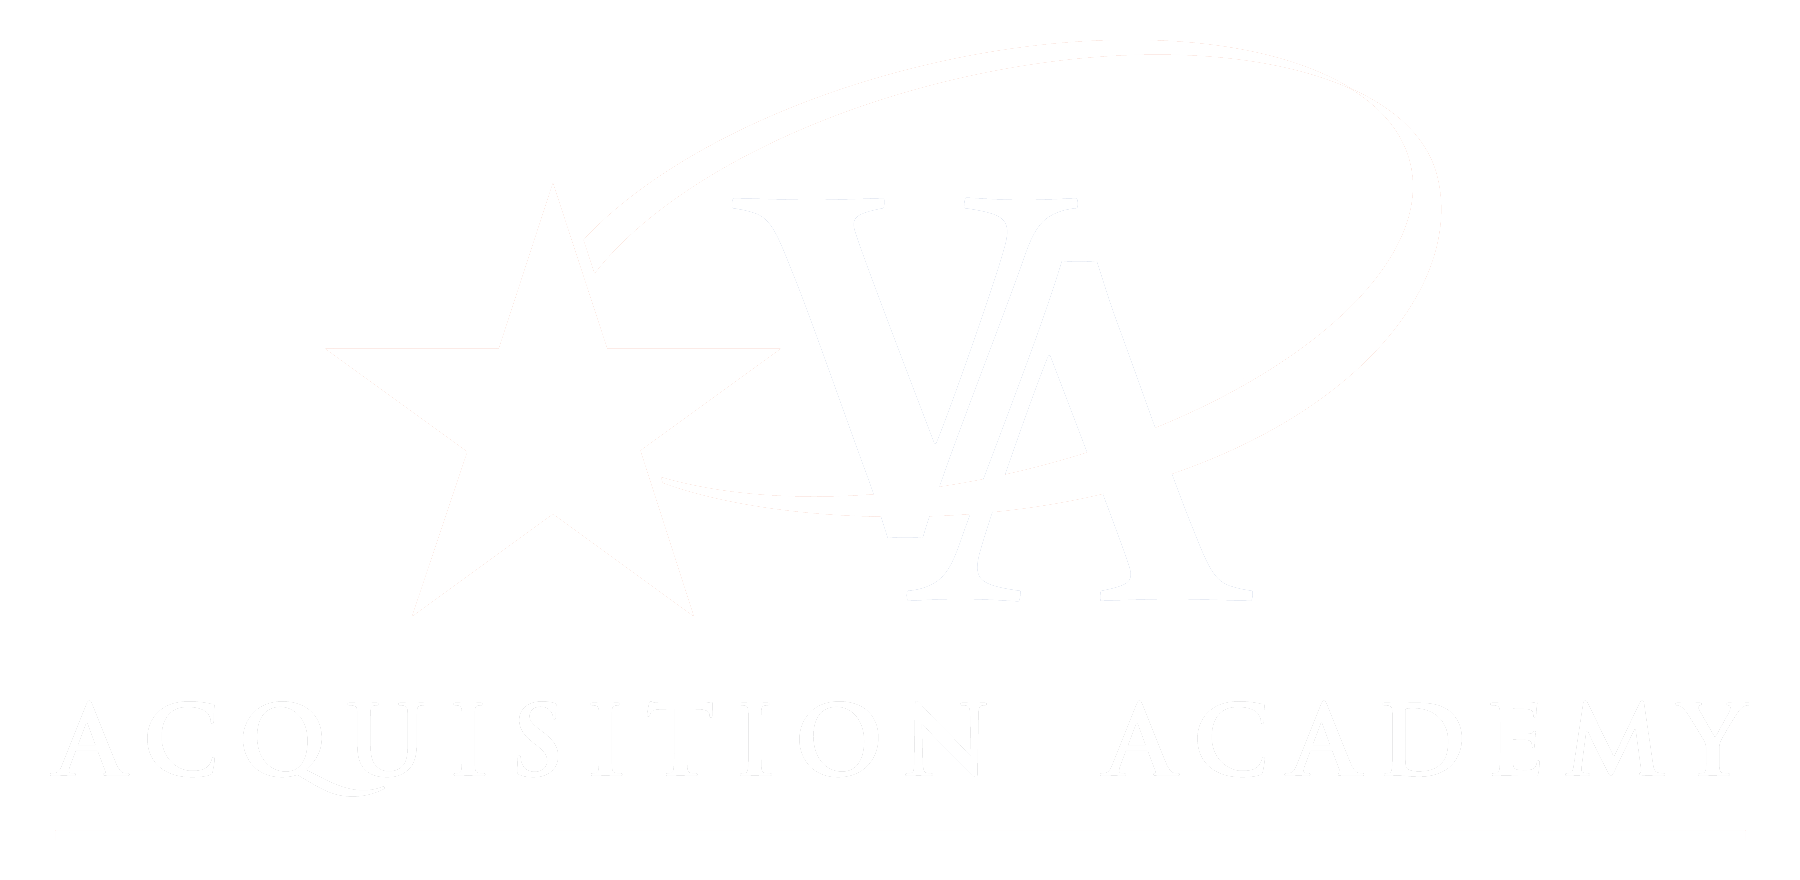 Veterans Affairs Acquisition Academy Vaaa